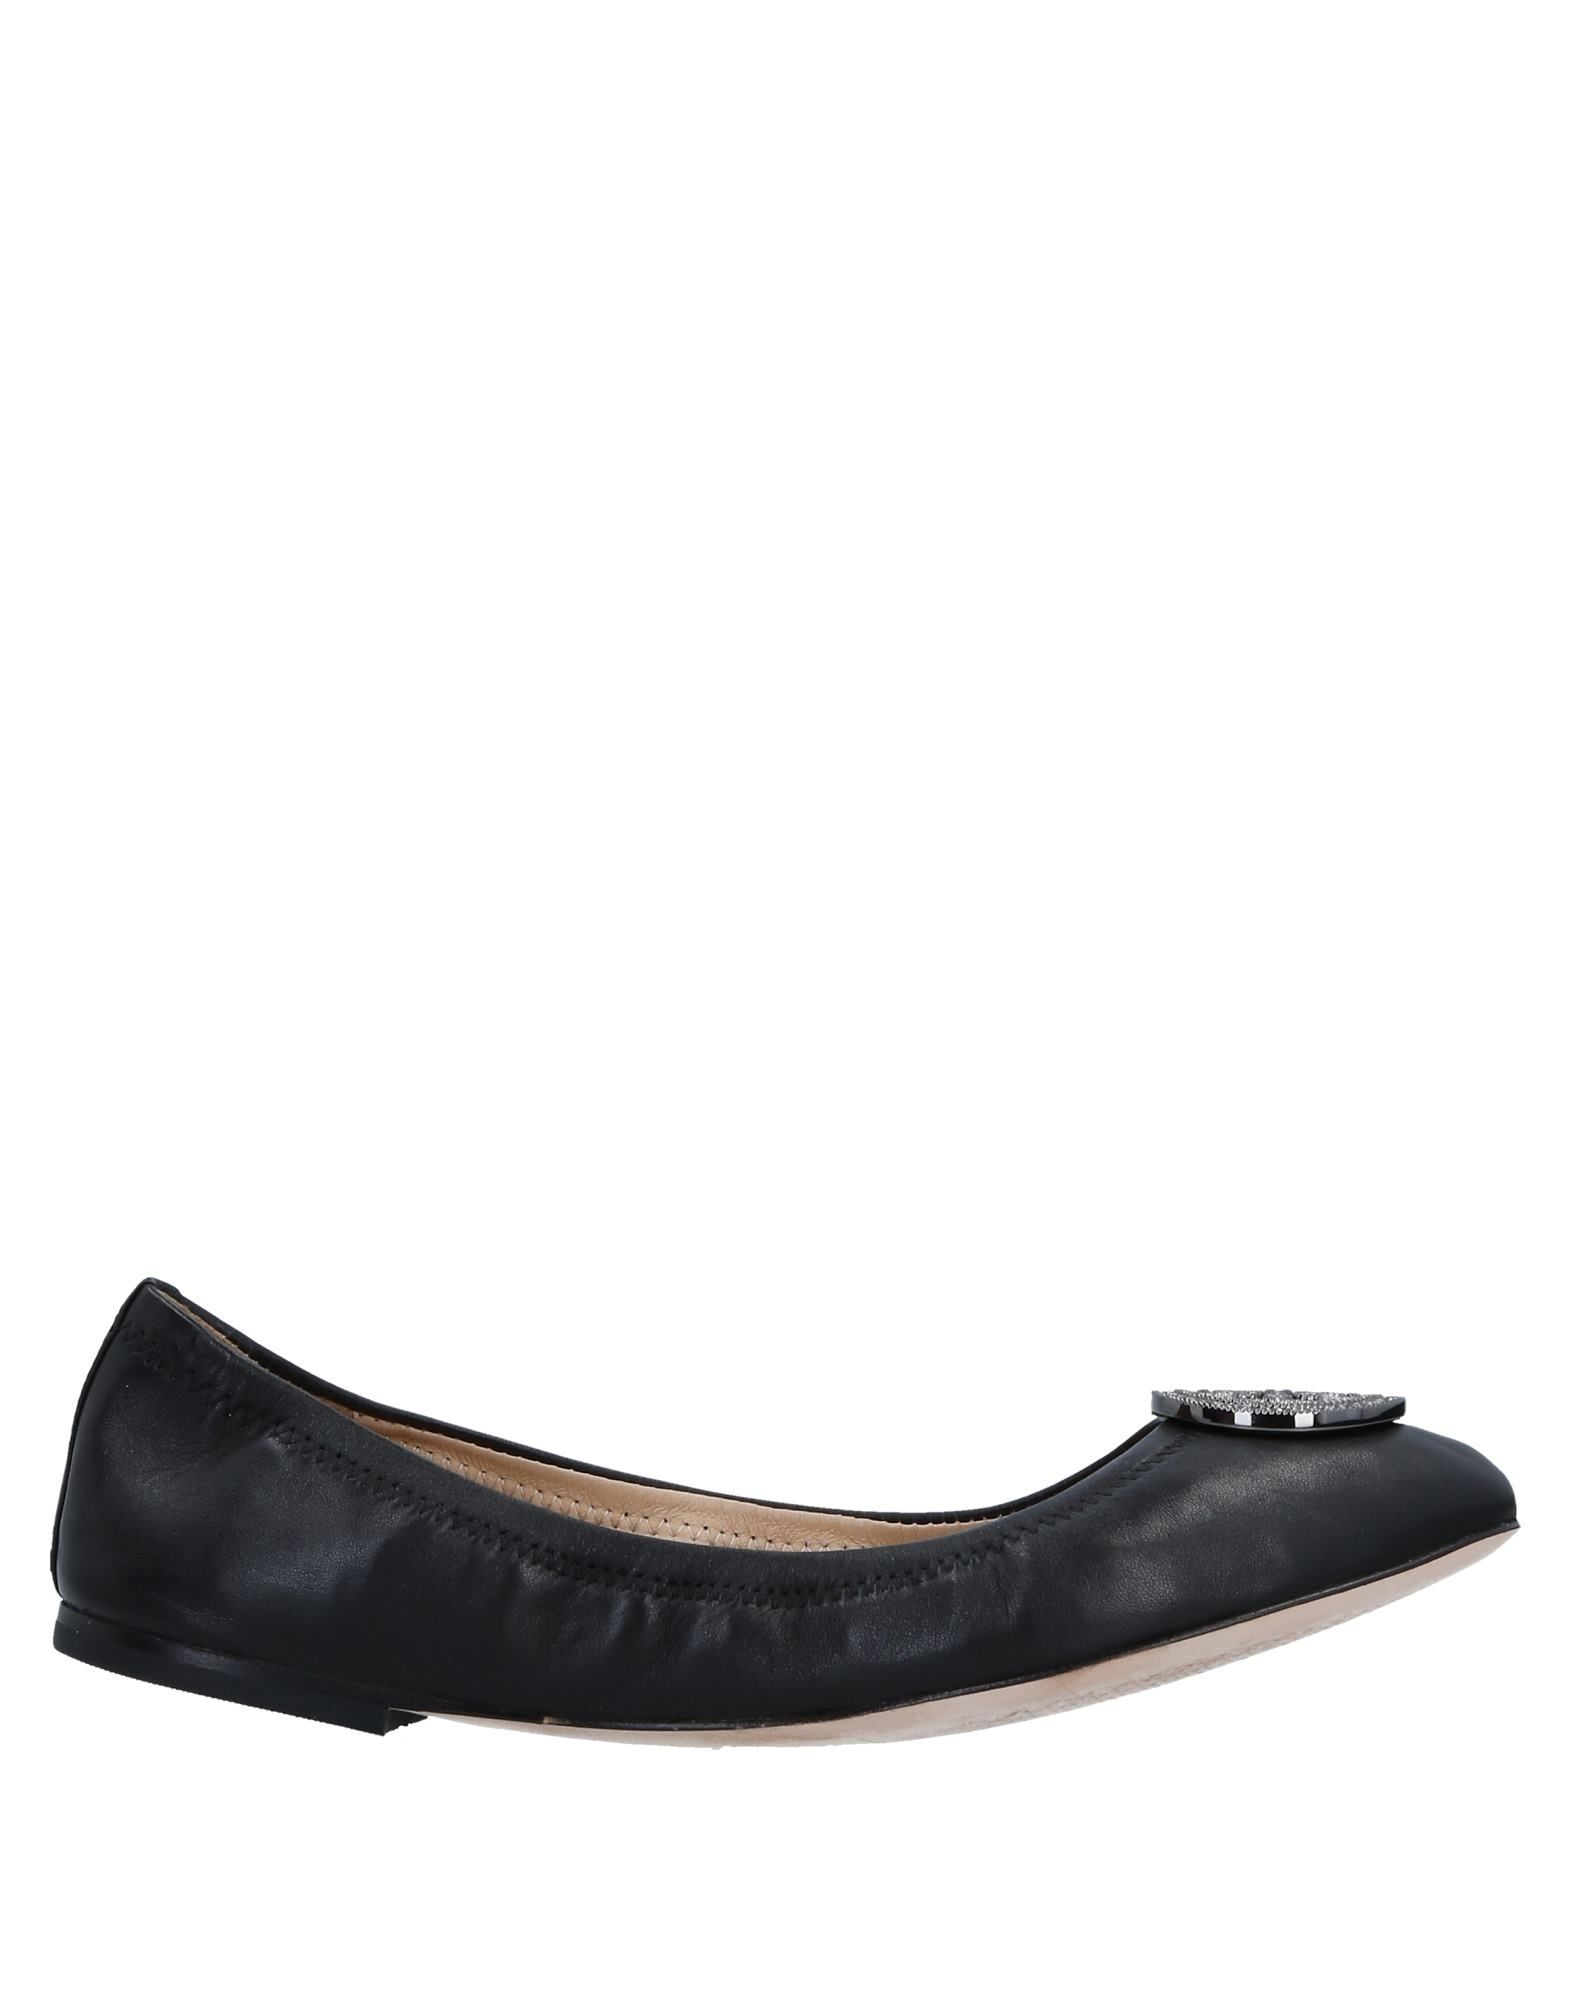 Tory Burch Ballerinas Damen  11534797HUGut aussehende strapazierfähige Schuhe